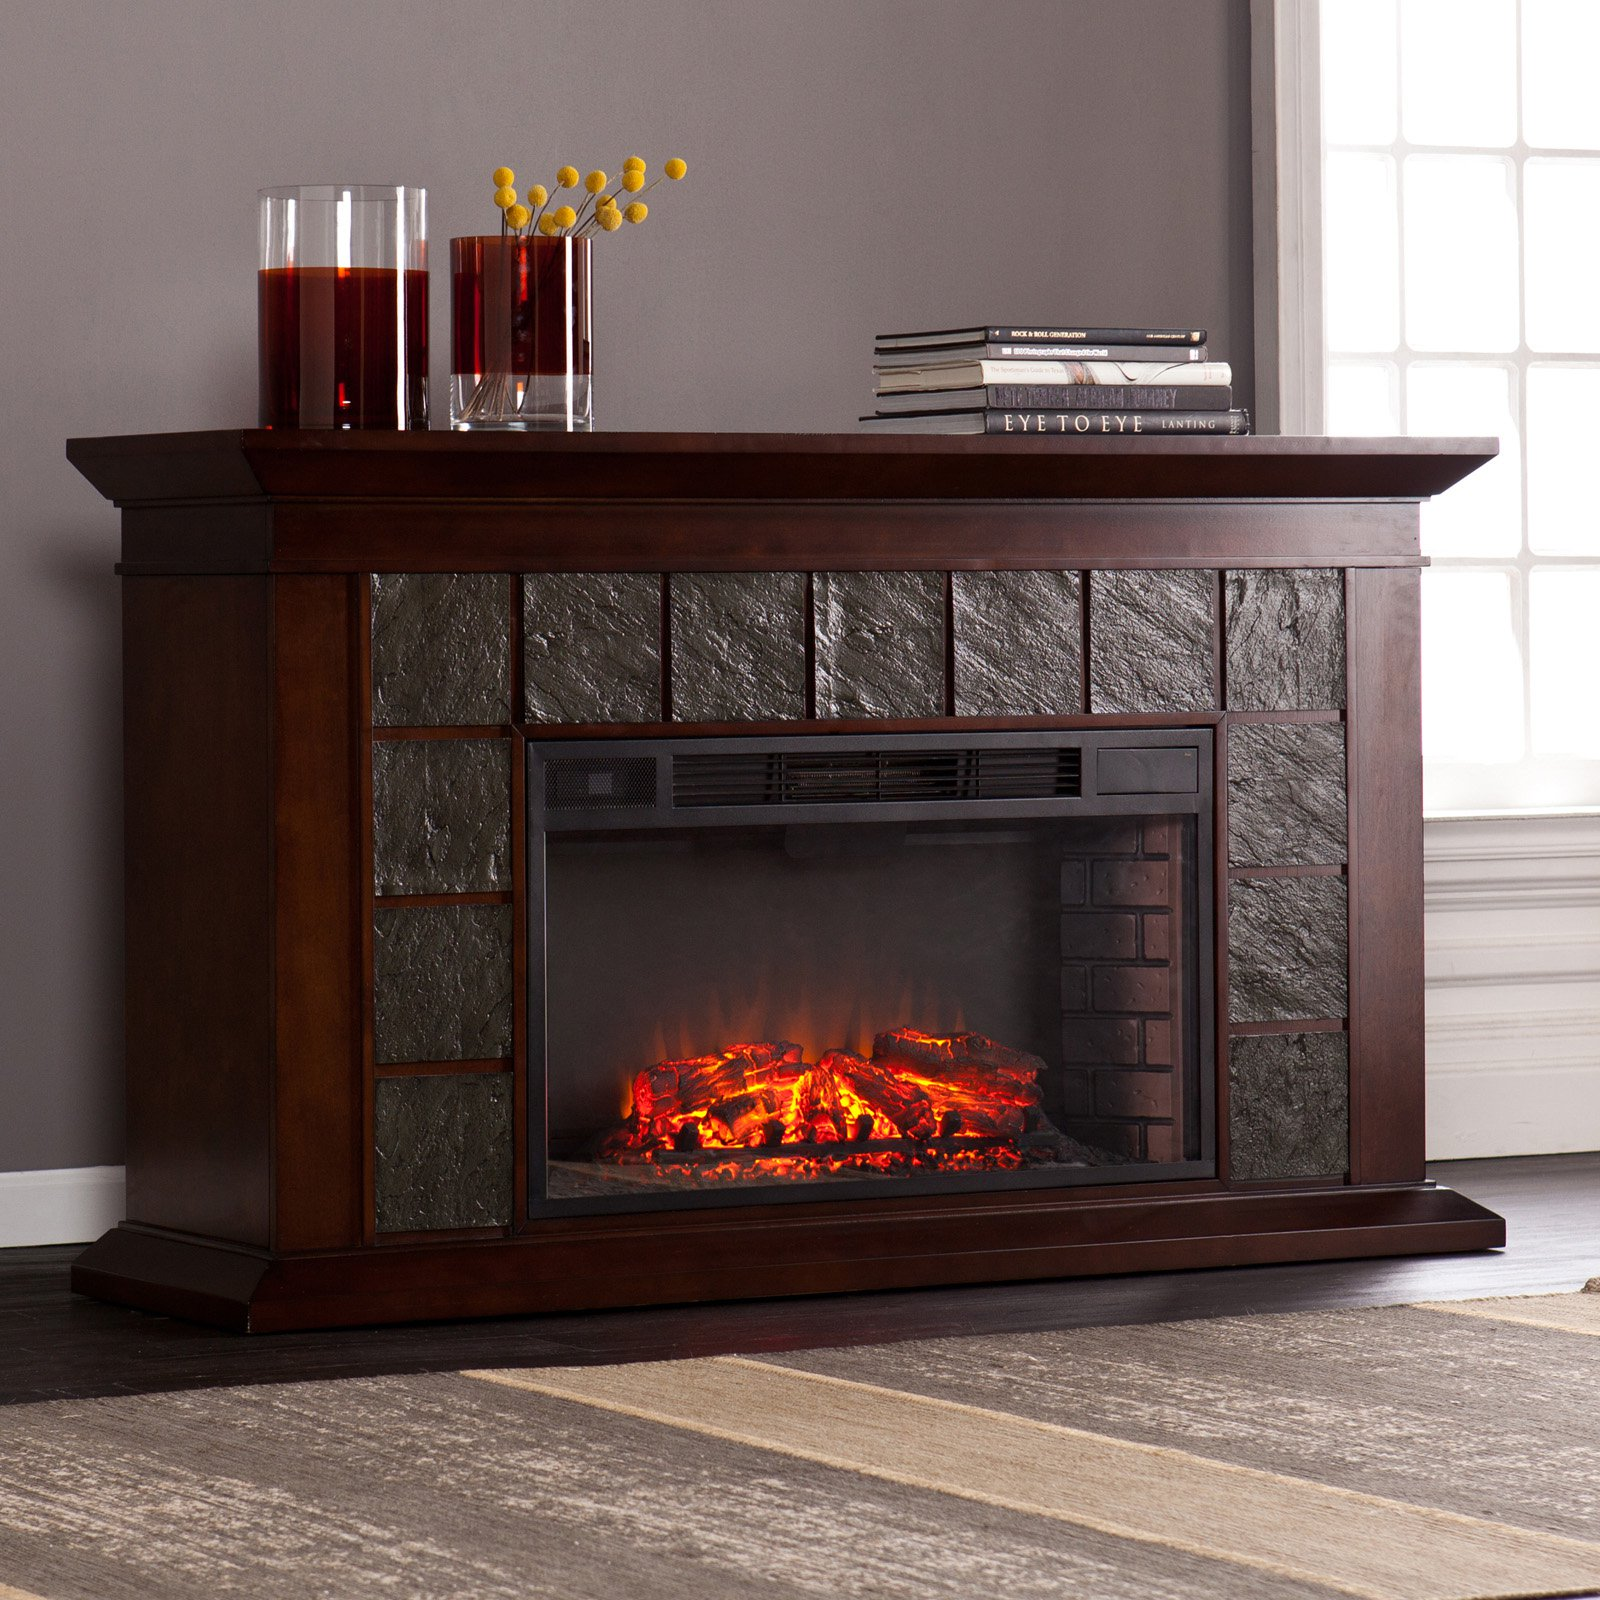 Southern Enterprises Mendicino Wide Firebox Electric Fireplace